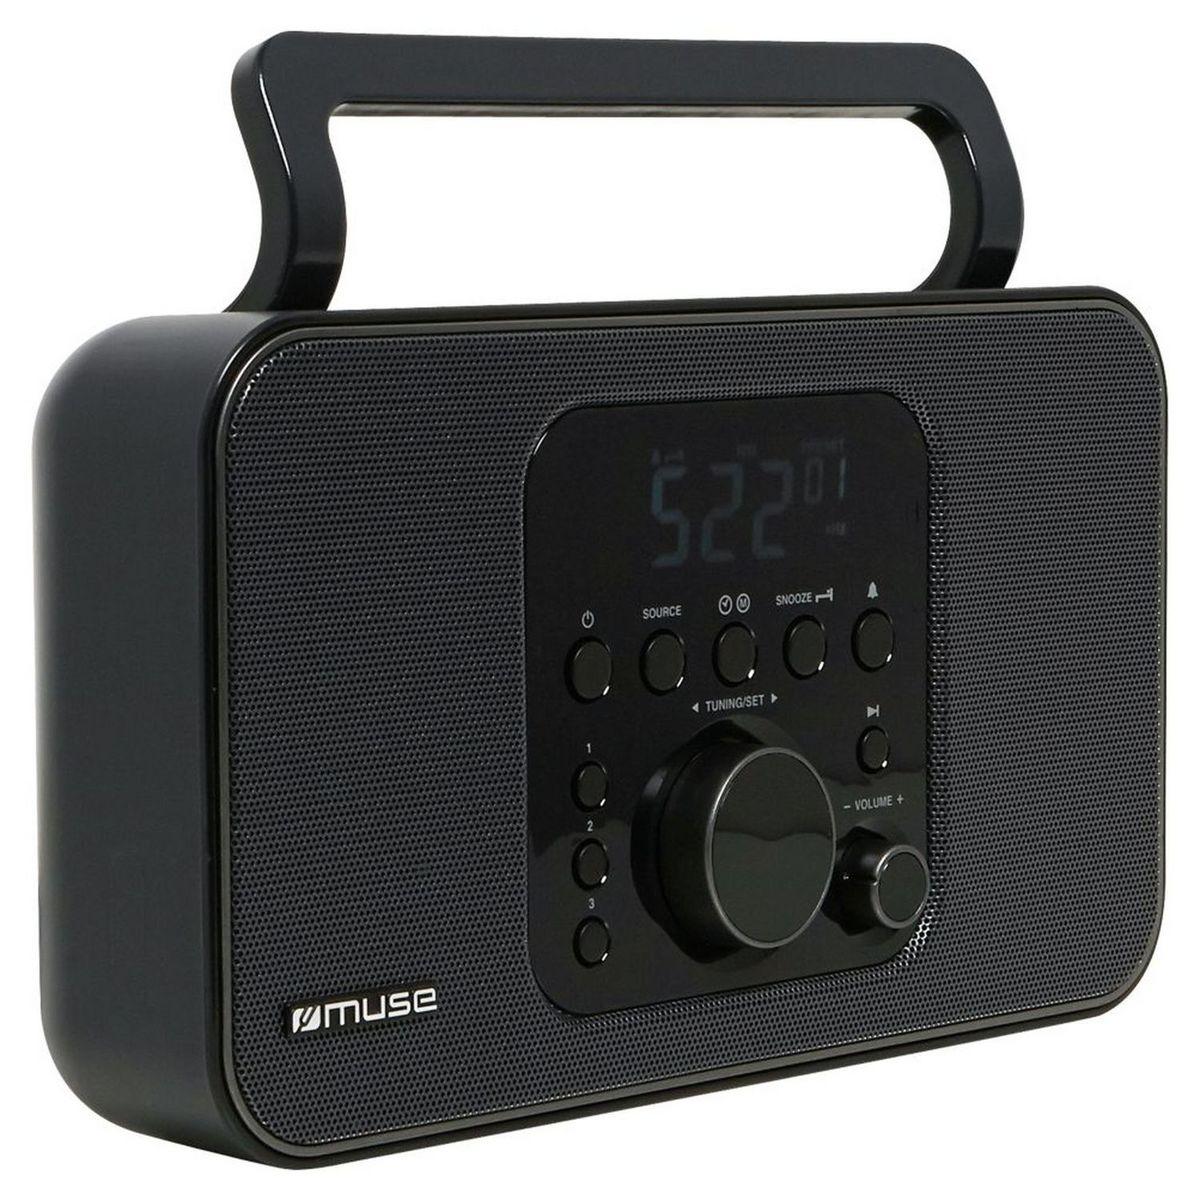 Radio portable analogique - Noir - M-091R